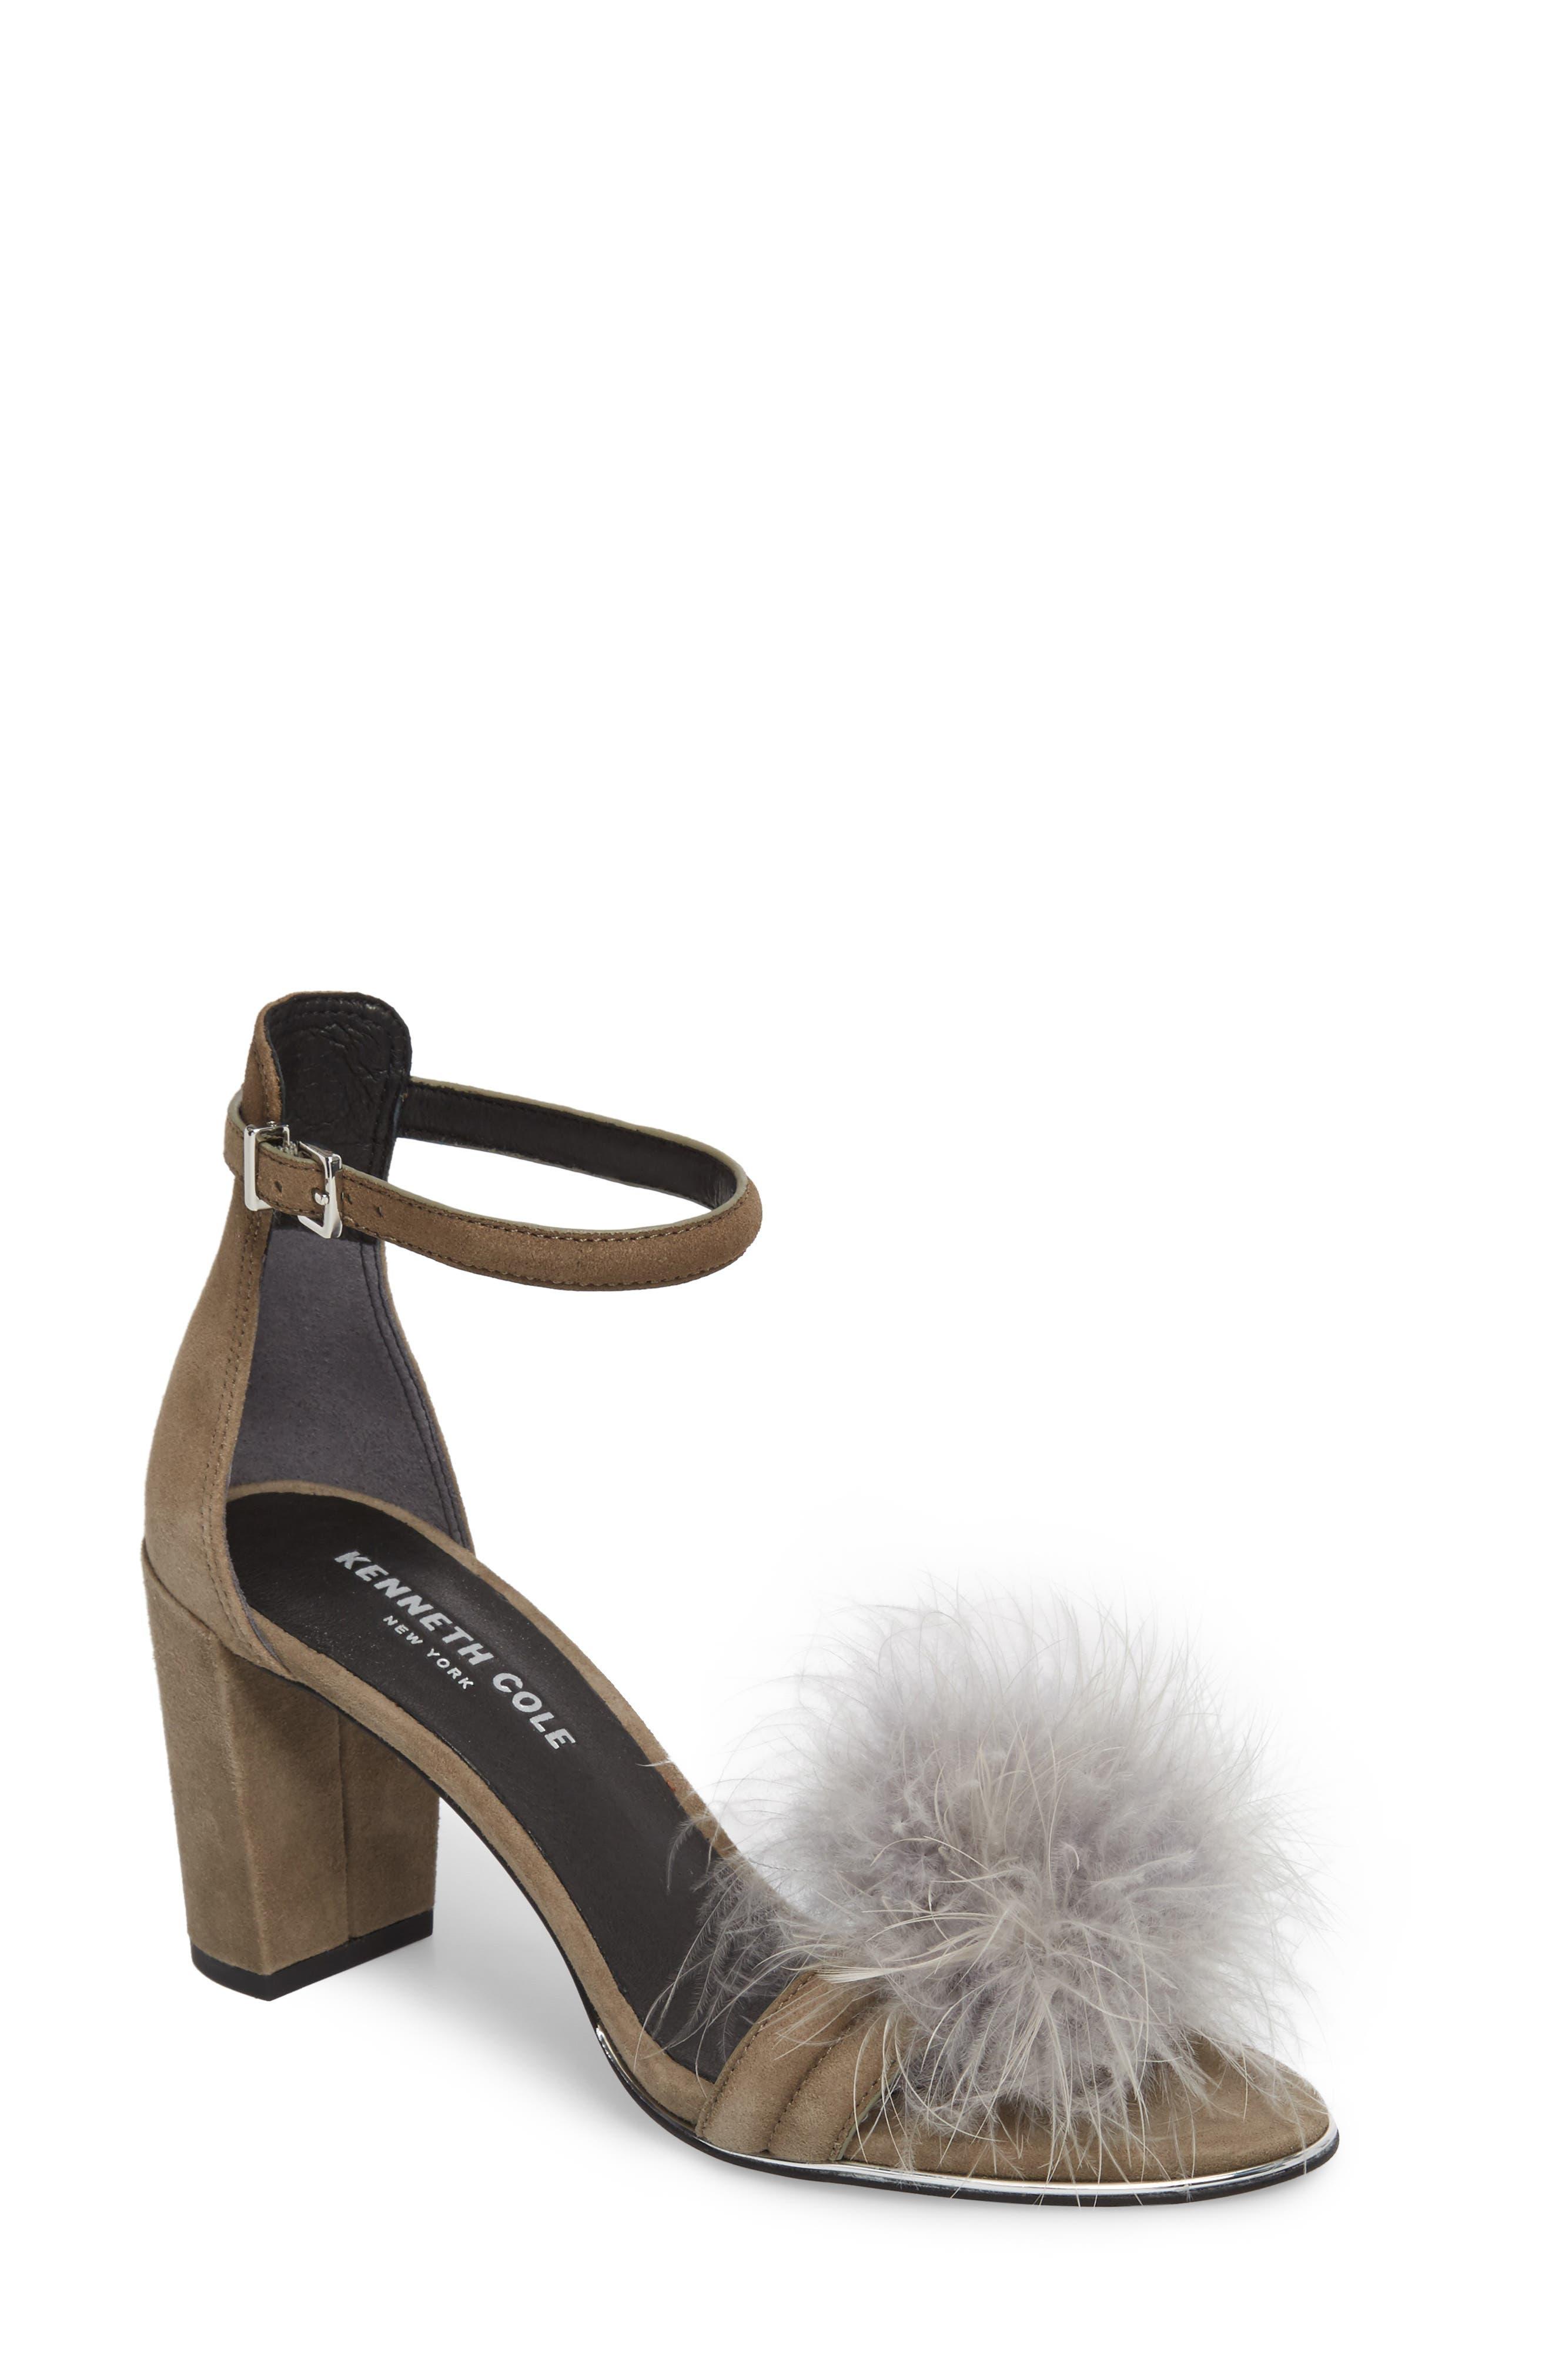 Lex 3 Sandal,                             Main thumbnail 1, color,                             020